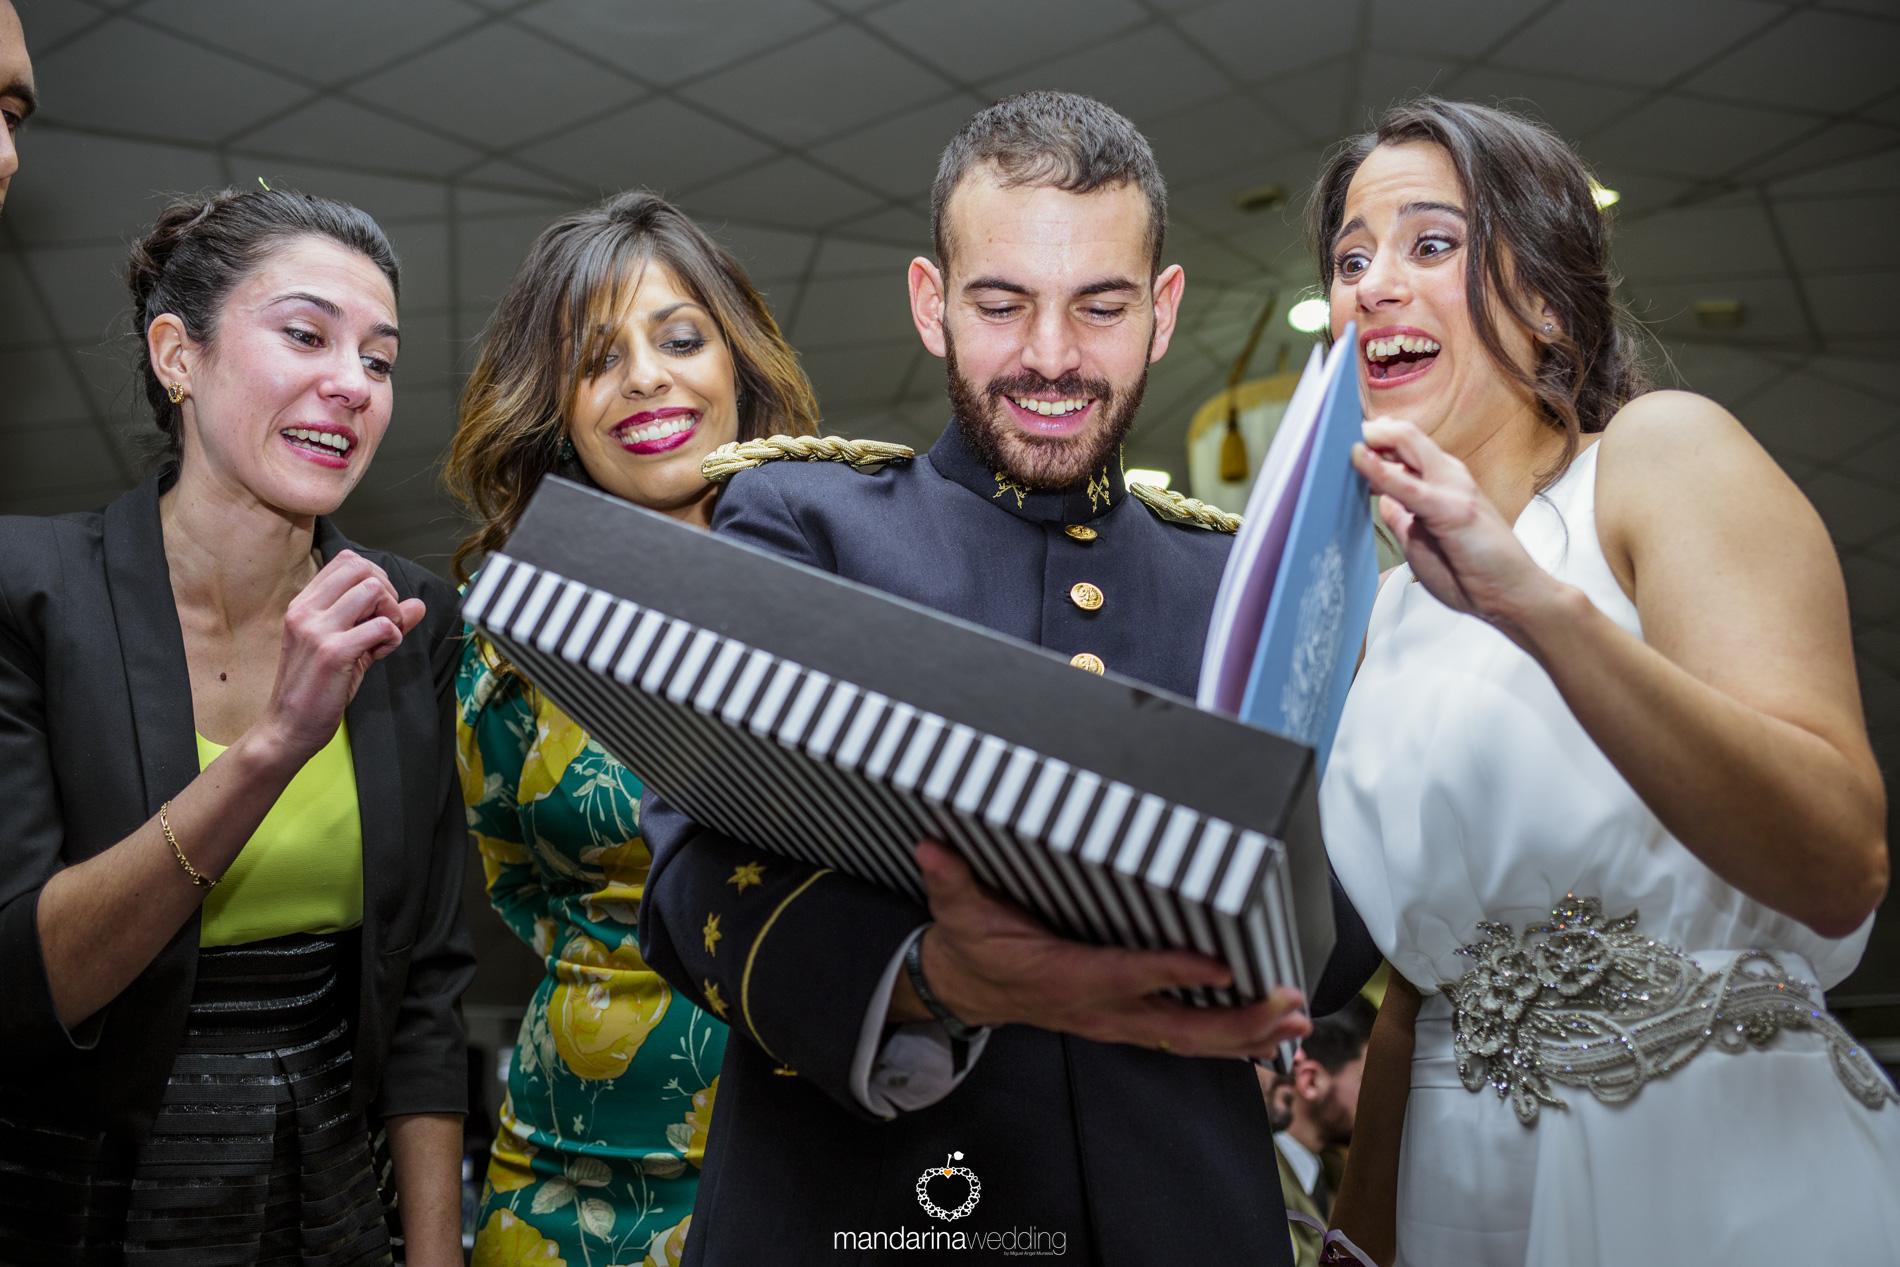 mandarina wedding, fotografos de boda, fotografo boda soria, fotografo boda barcelona, fotografo boda Madrid, fotógrafo boda lerida_24